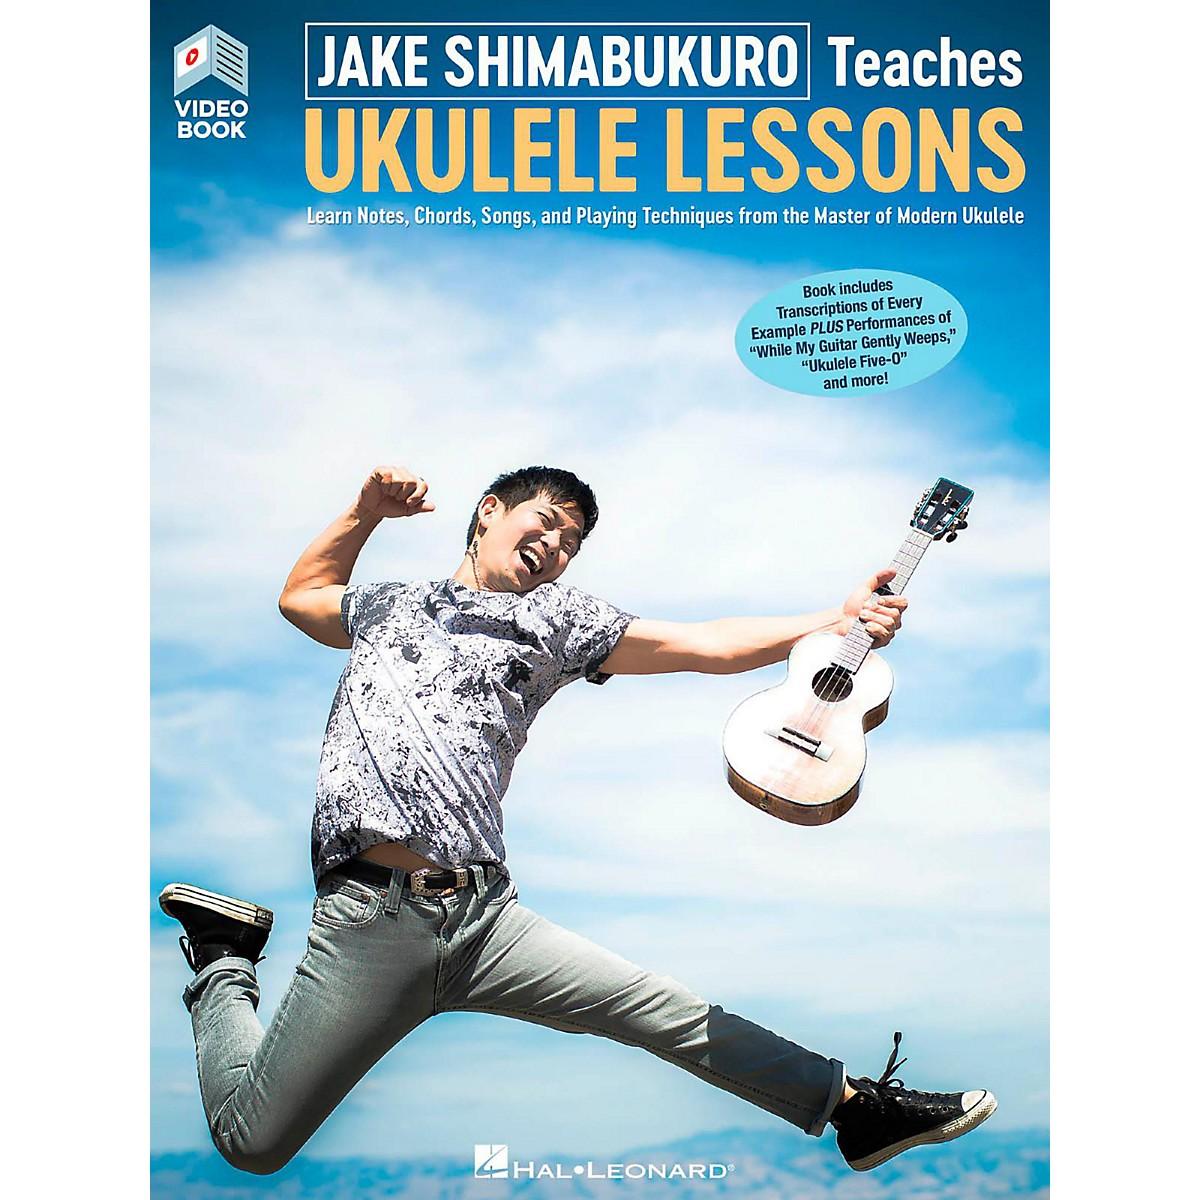 Hal Leonard Jake Shimabukuro Teaches Ukulele Lessons (Video/Book)